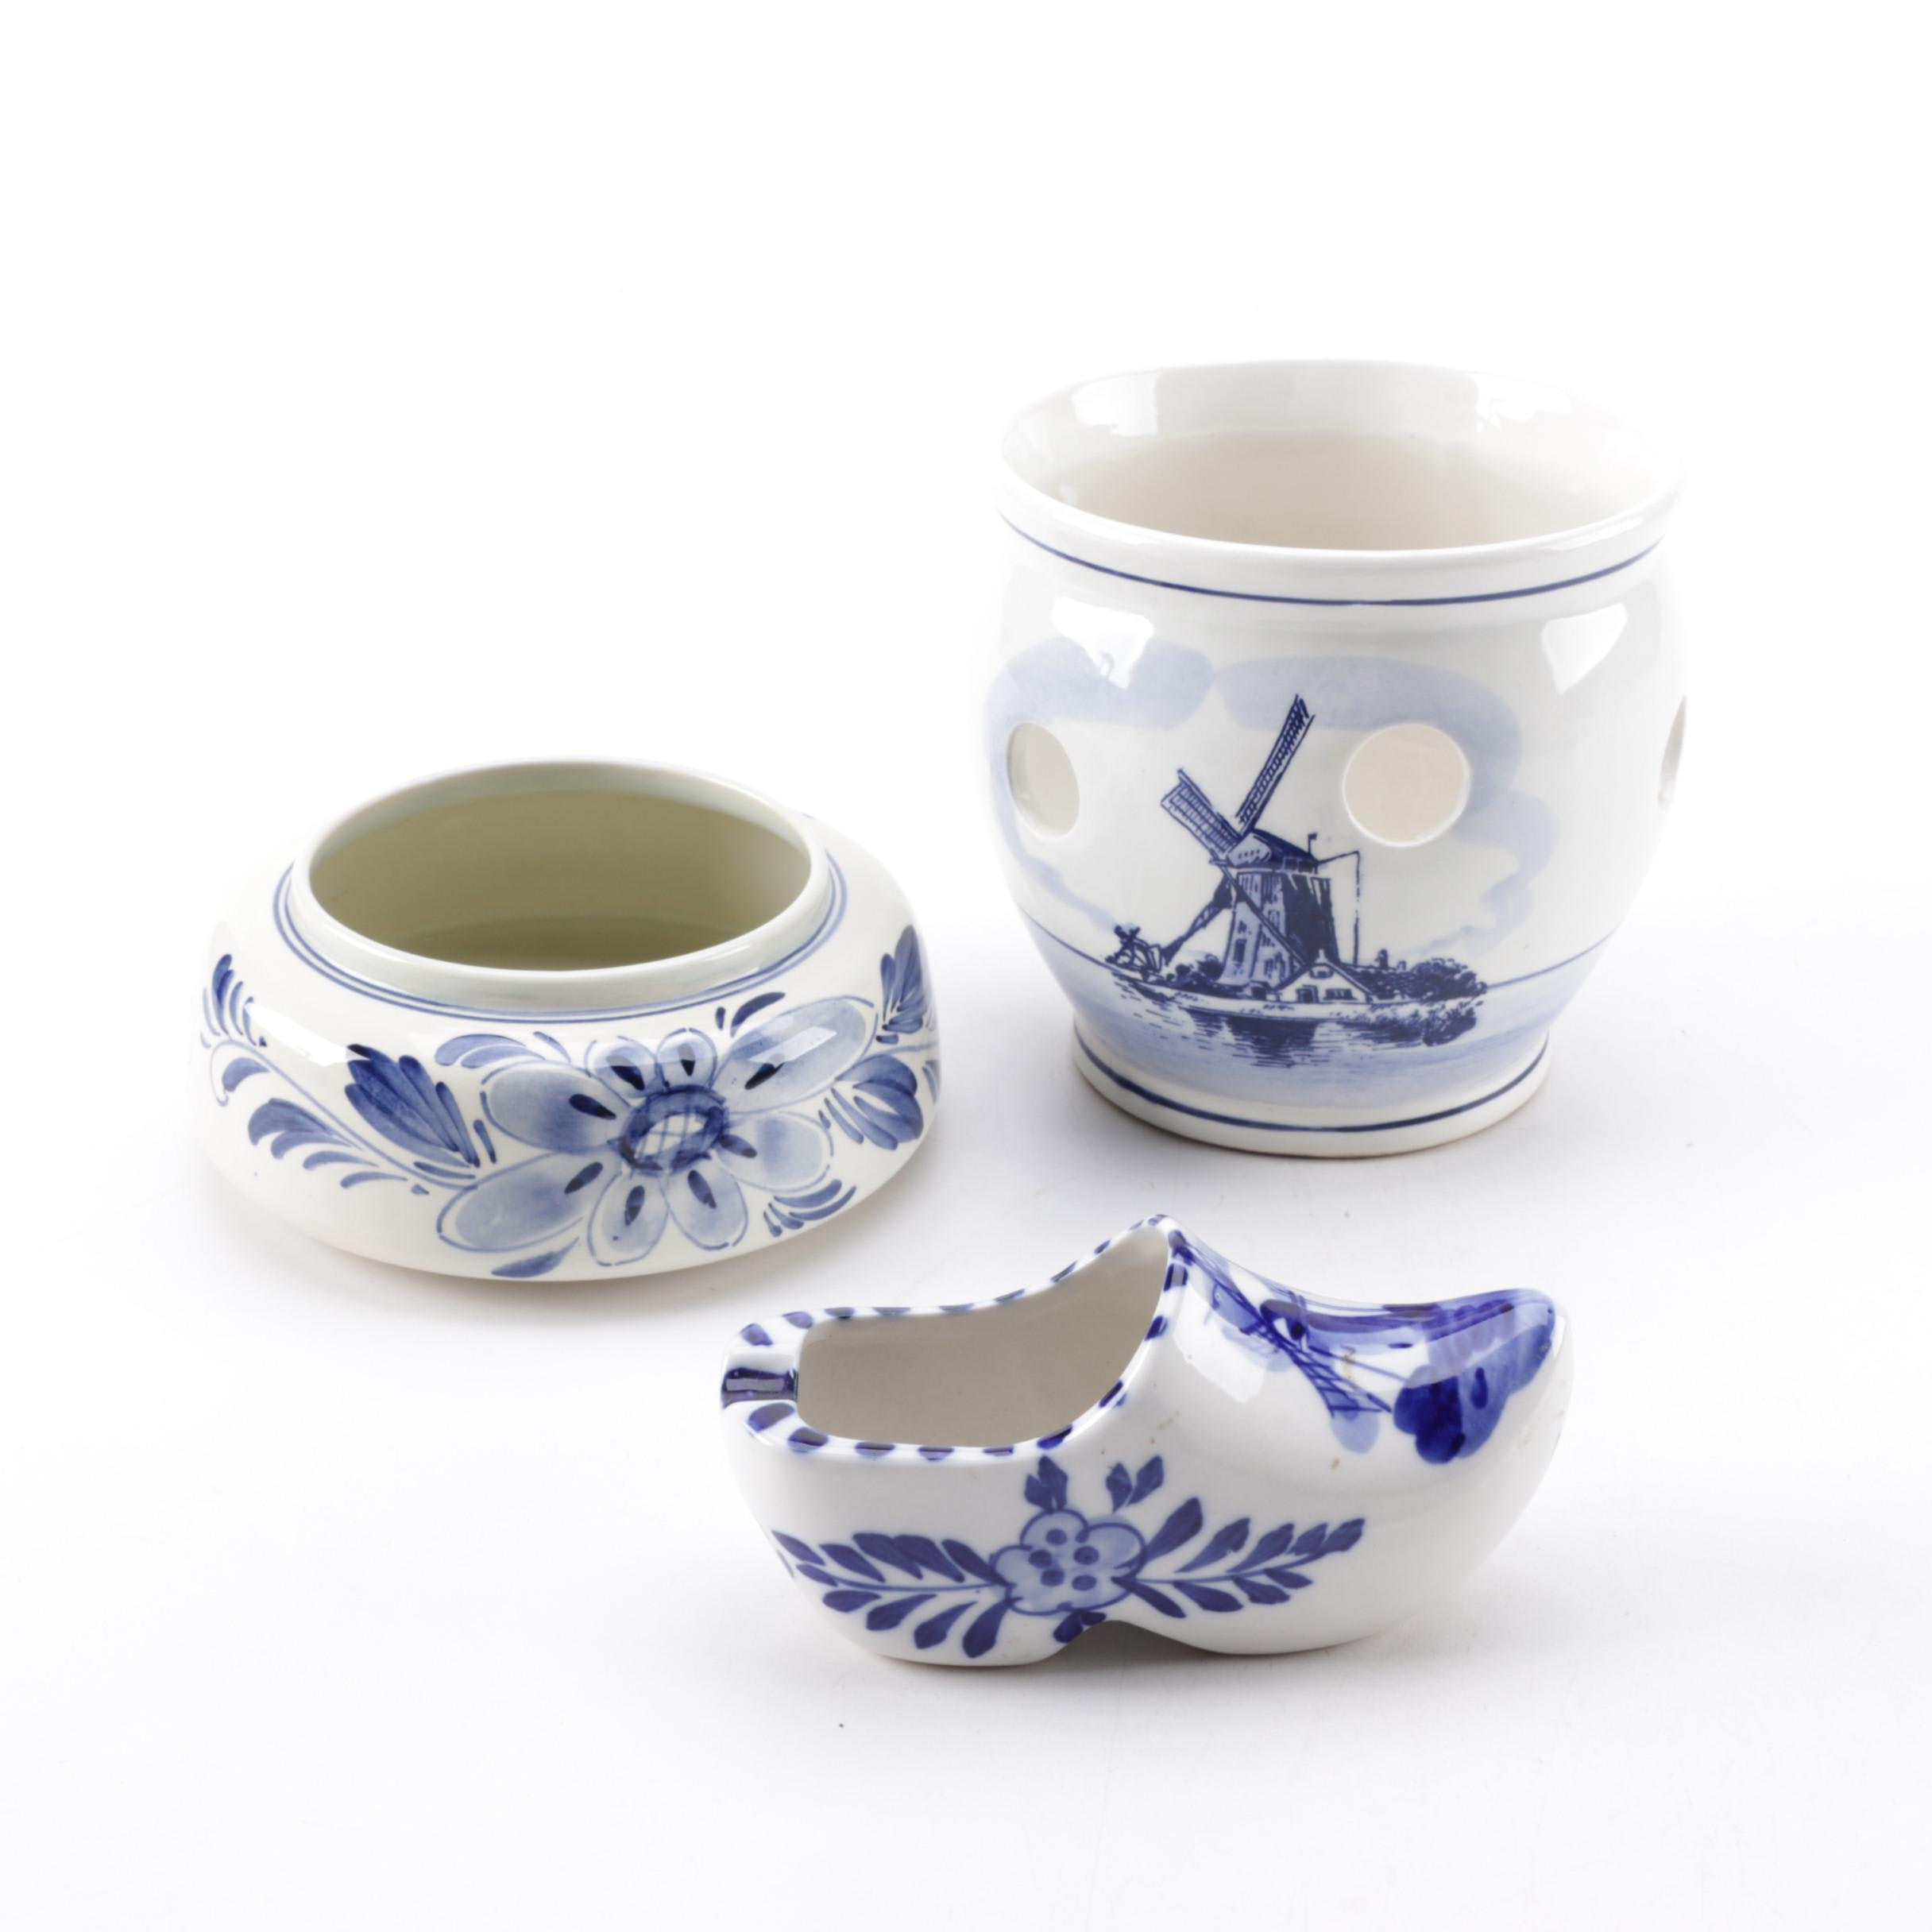 Delft Blue and White Porcelain Assortment